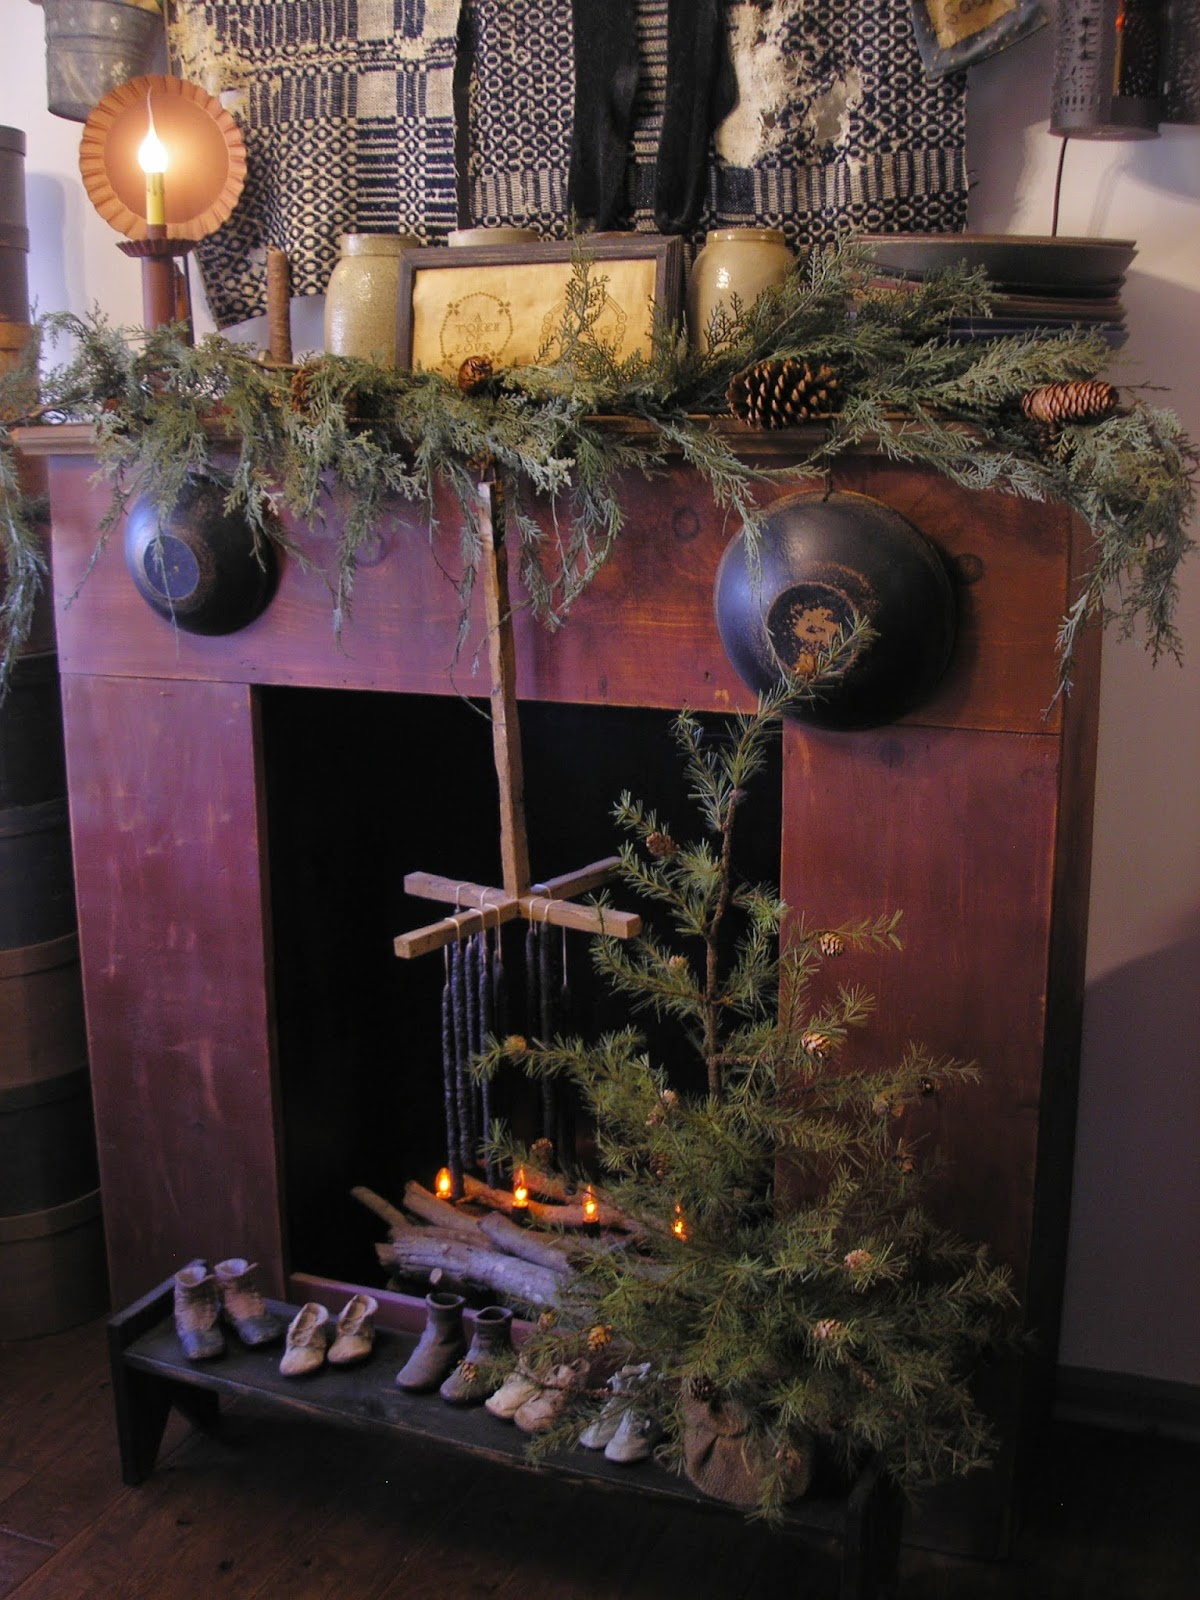 Taylors Farmhouse Attic Merry Christmas 2014